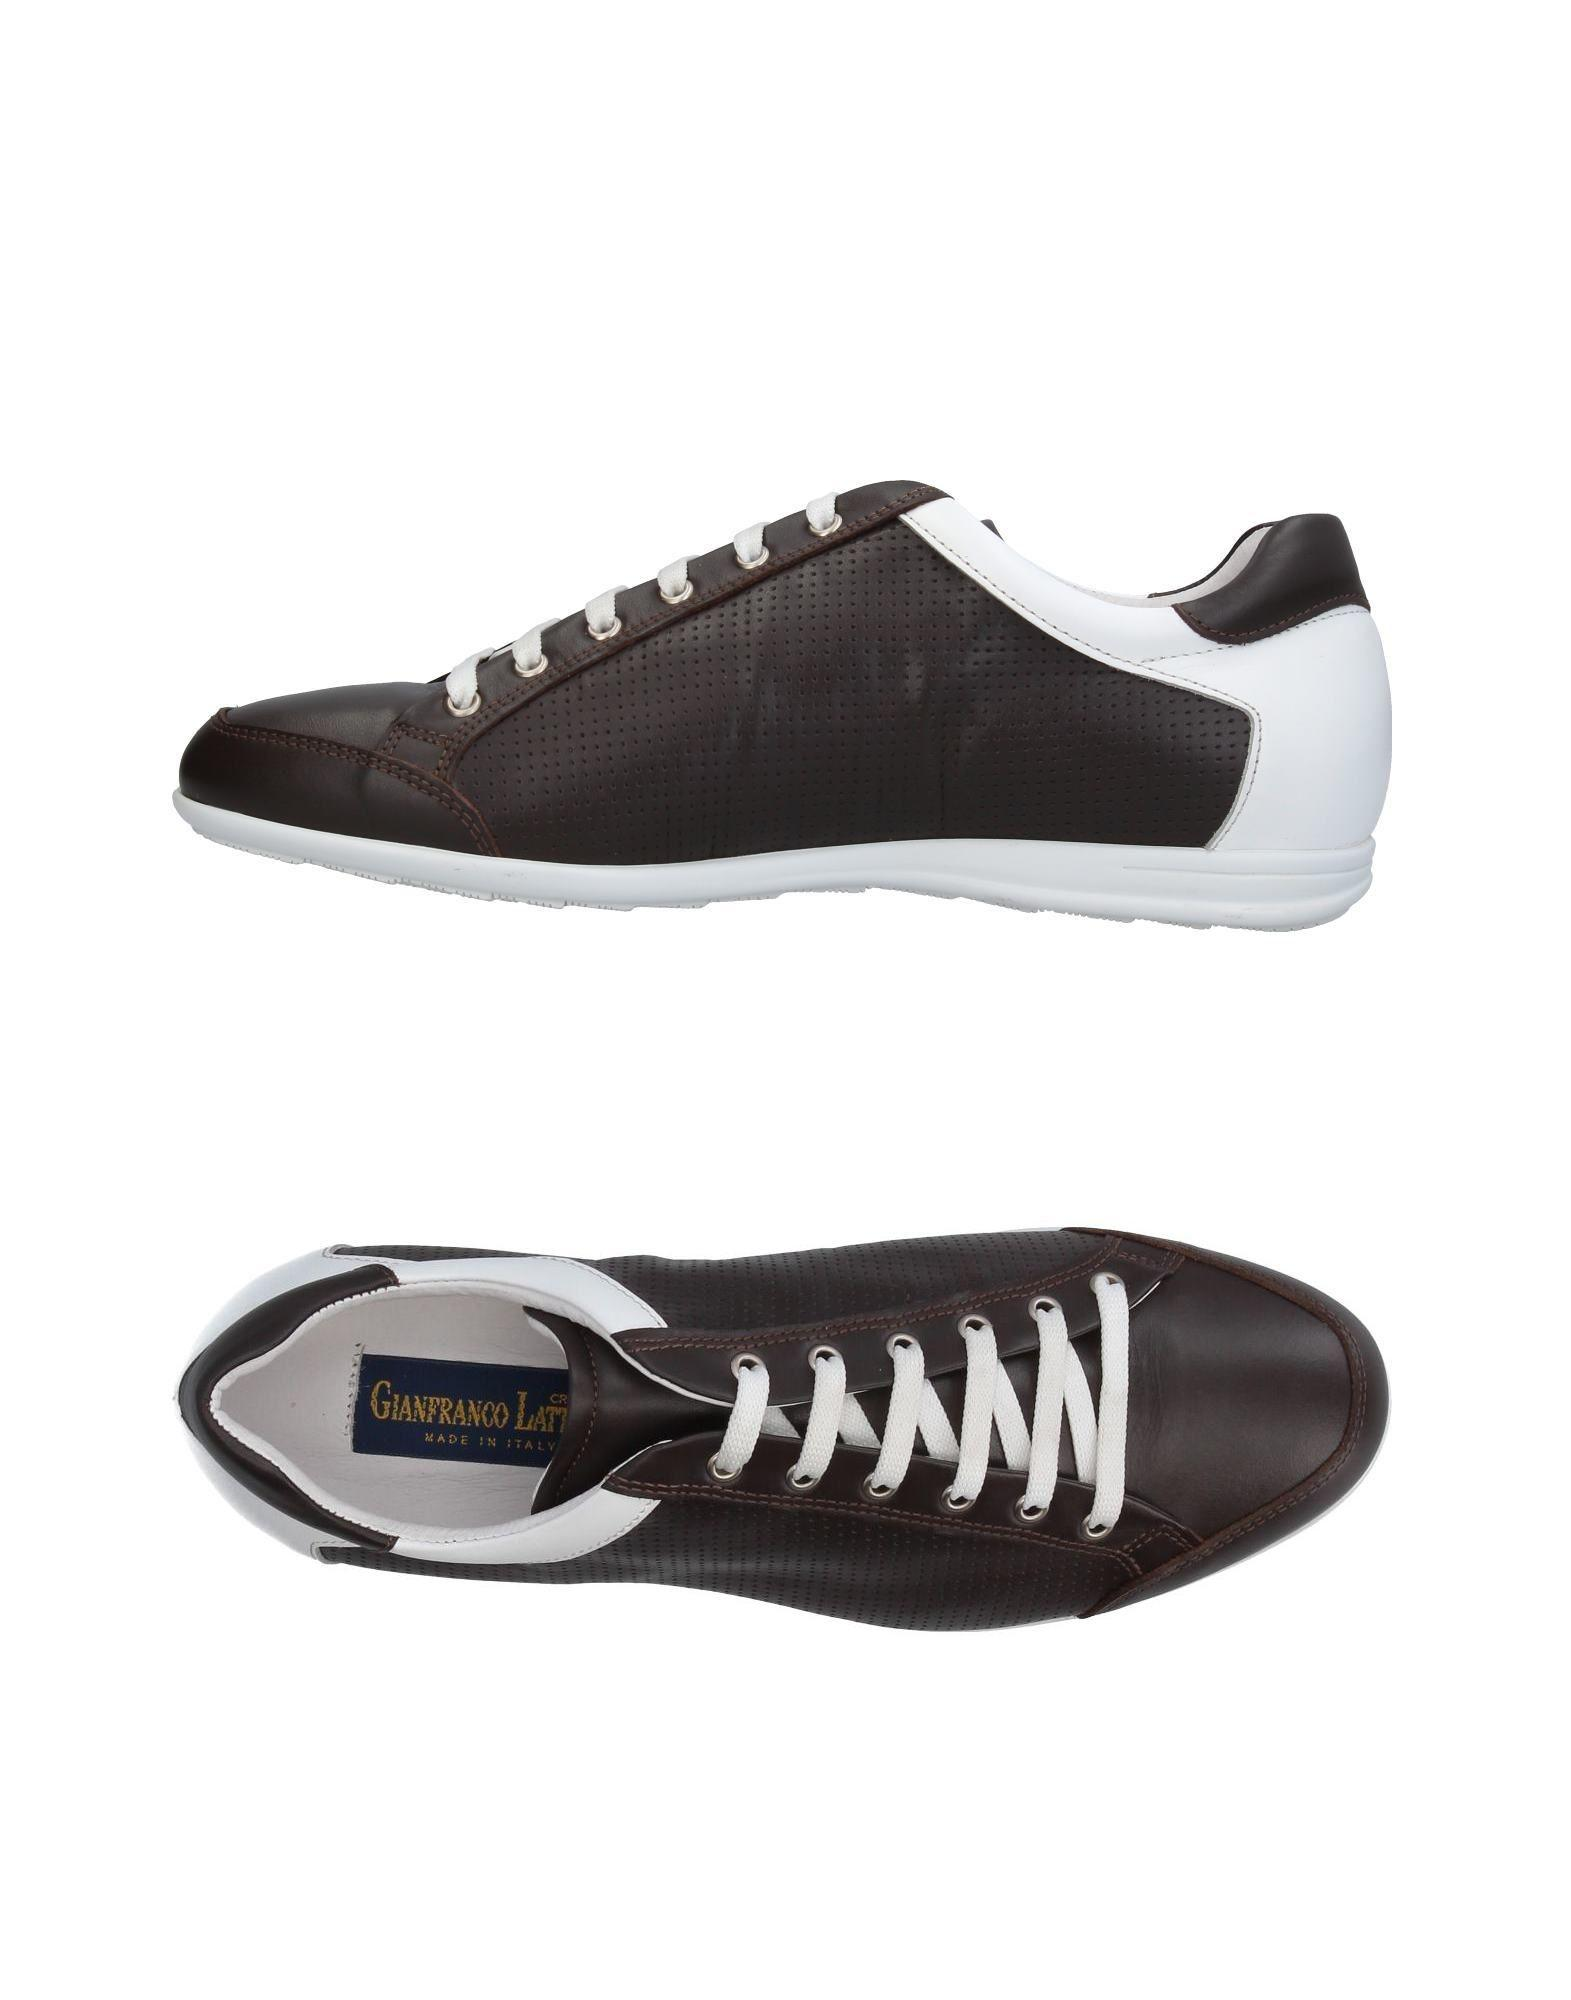 Chaussures - Bas-tops Et Baskets Gianfranco Lattanzi 4csf5A90